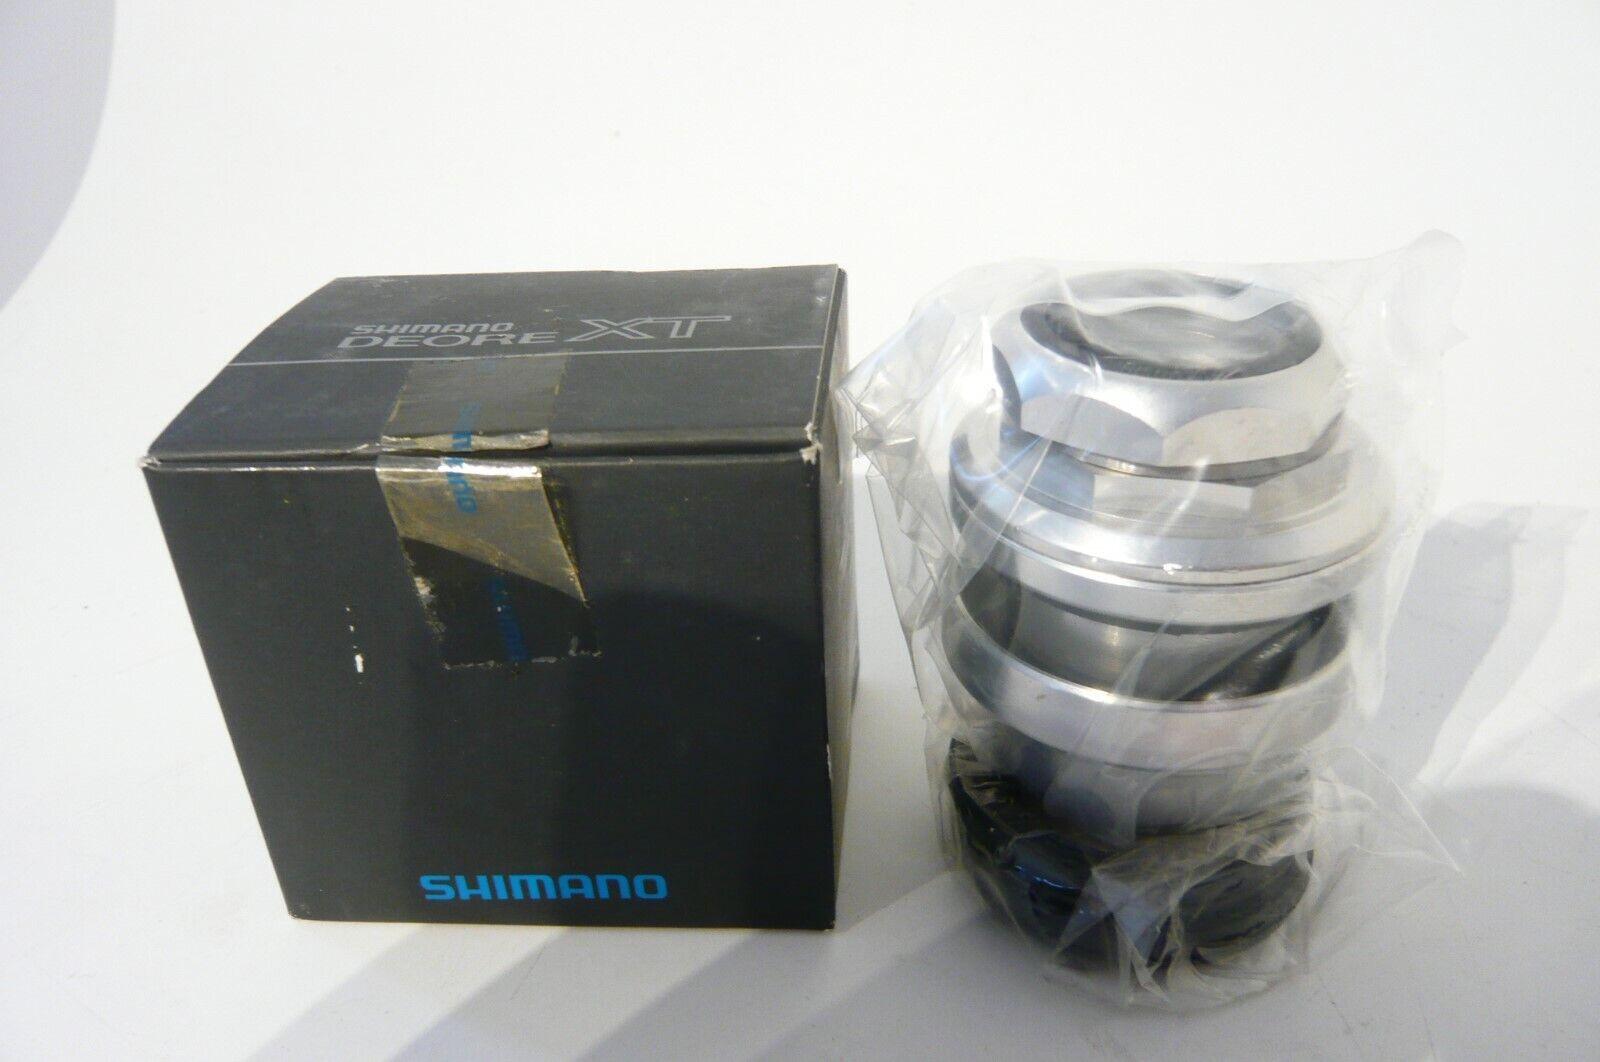 Shimano HP-M741 Deore XT B.C. 1- 1 8 x 26T  cartridge bearings headset